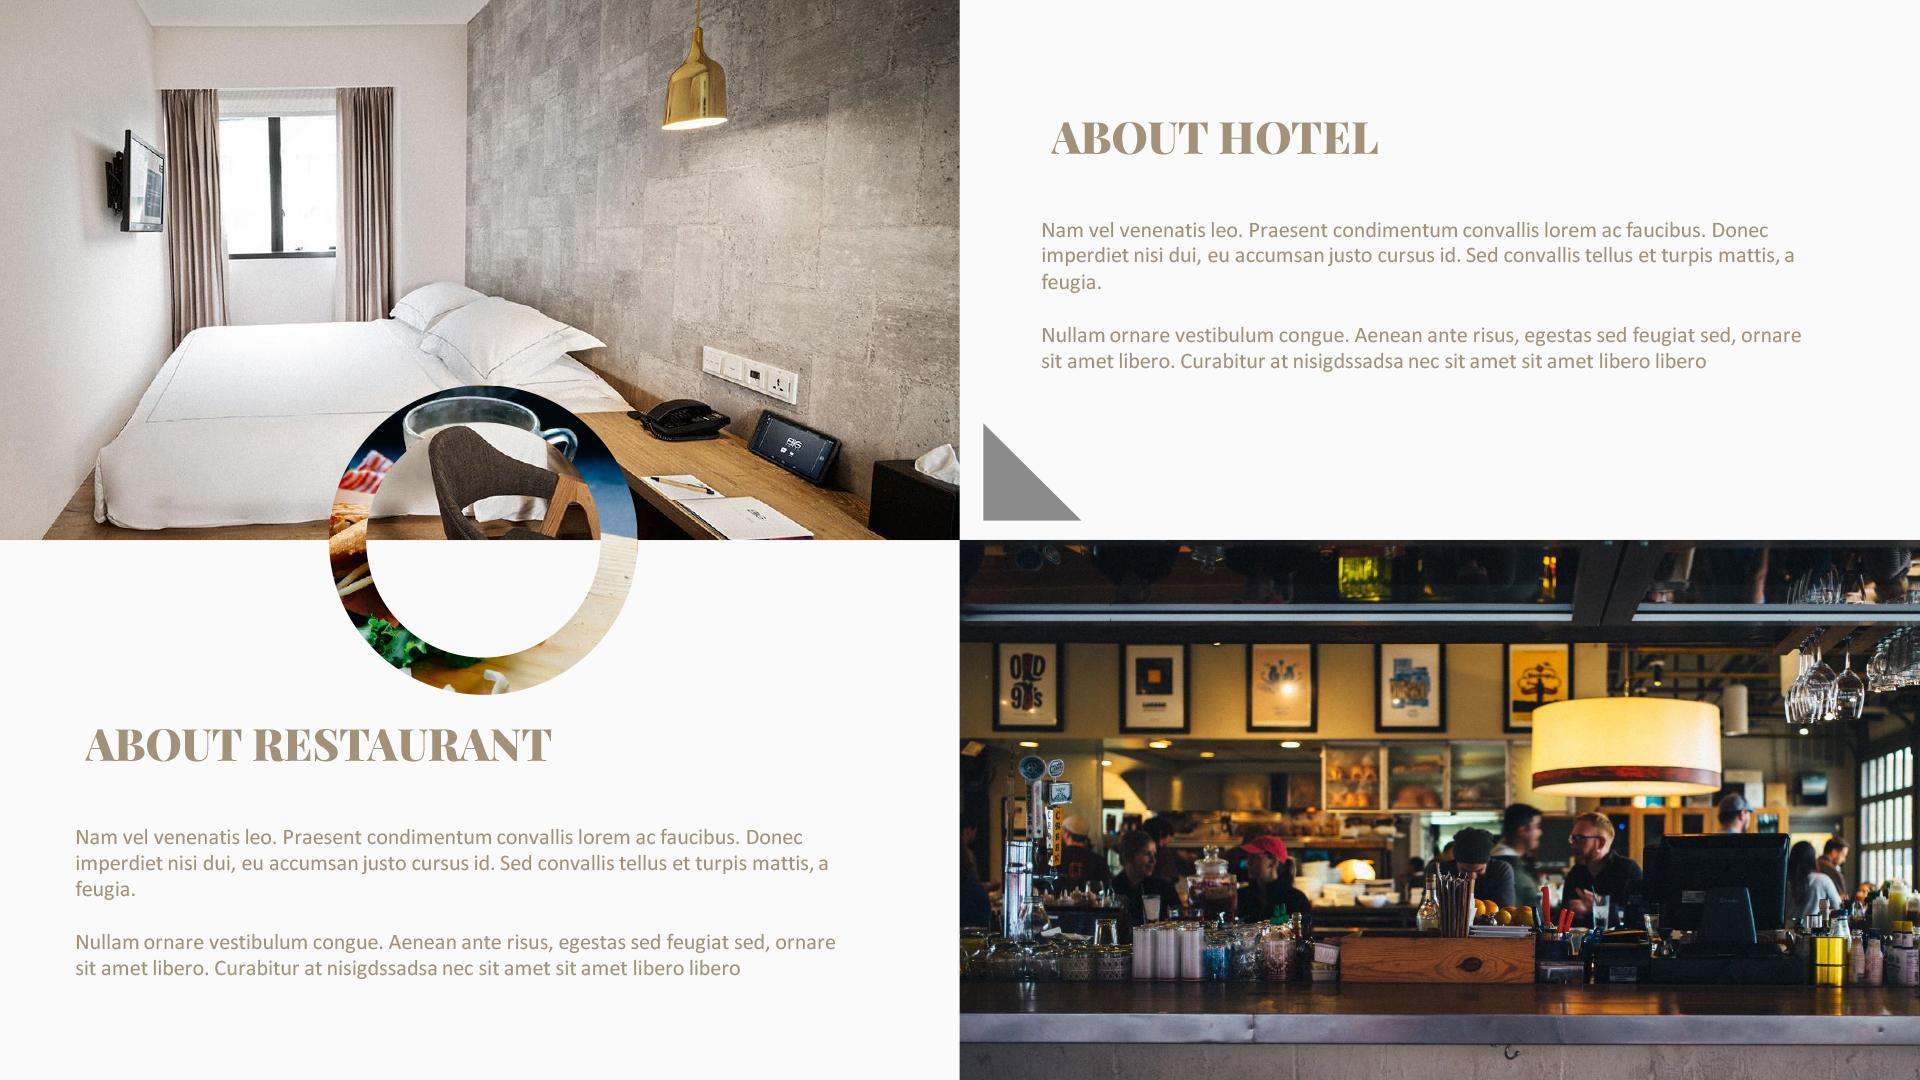 Hotel premium powerpoint presentation by qartwell graphicriver hotel premium powerpoint presentation toneelgroepblik Image collections